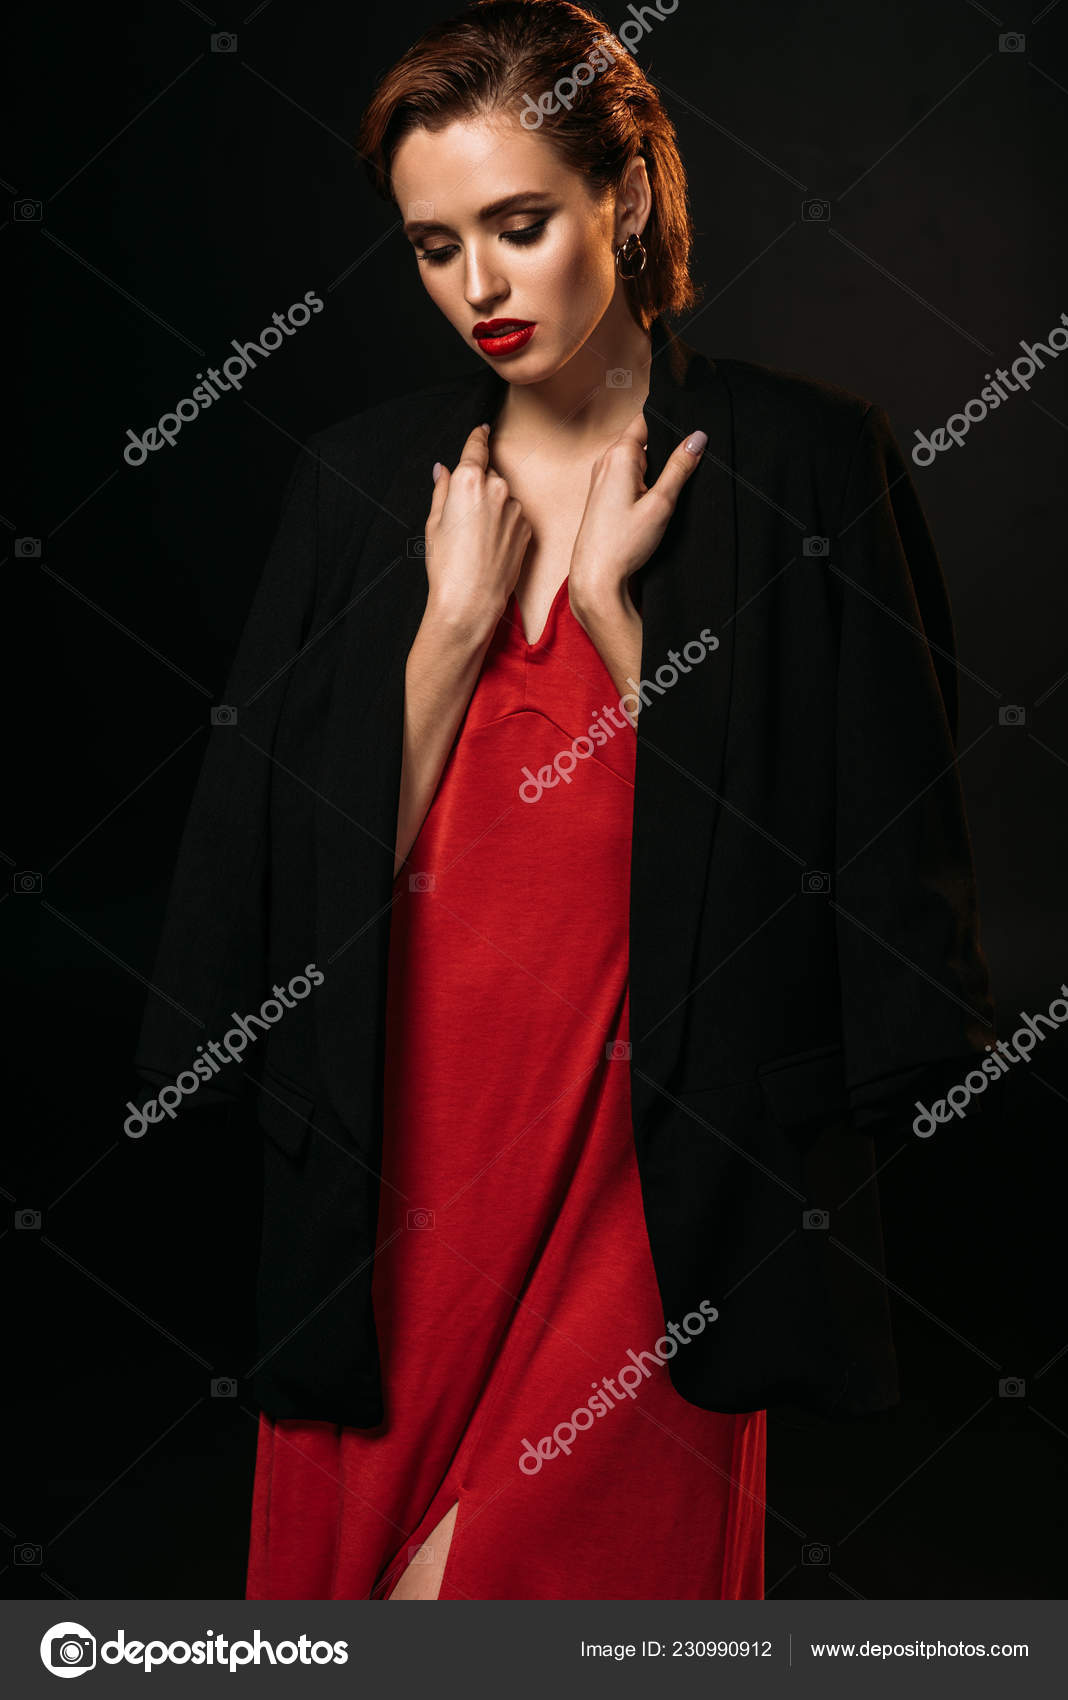 Negra Chaqueta Chica Vestido Atractiva Negro Aislado Mirando Rojo dtRItxqw